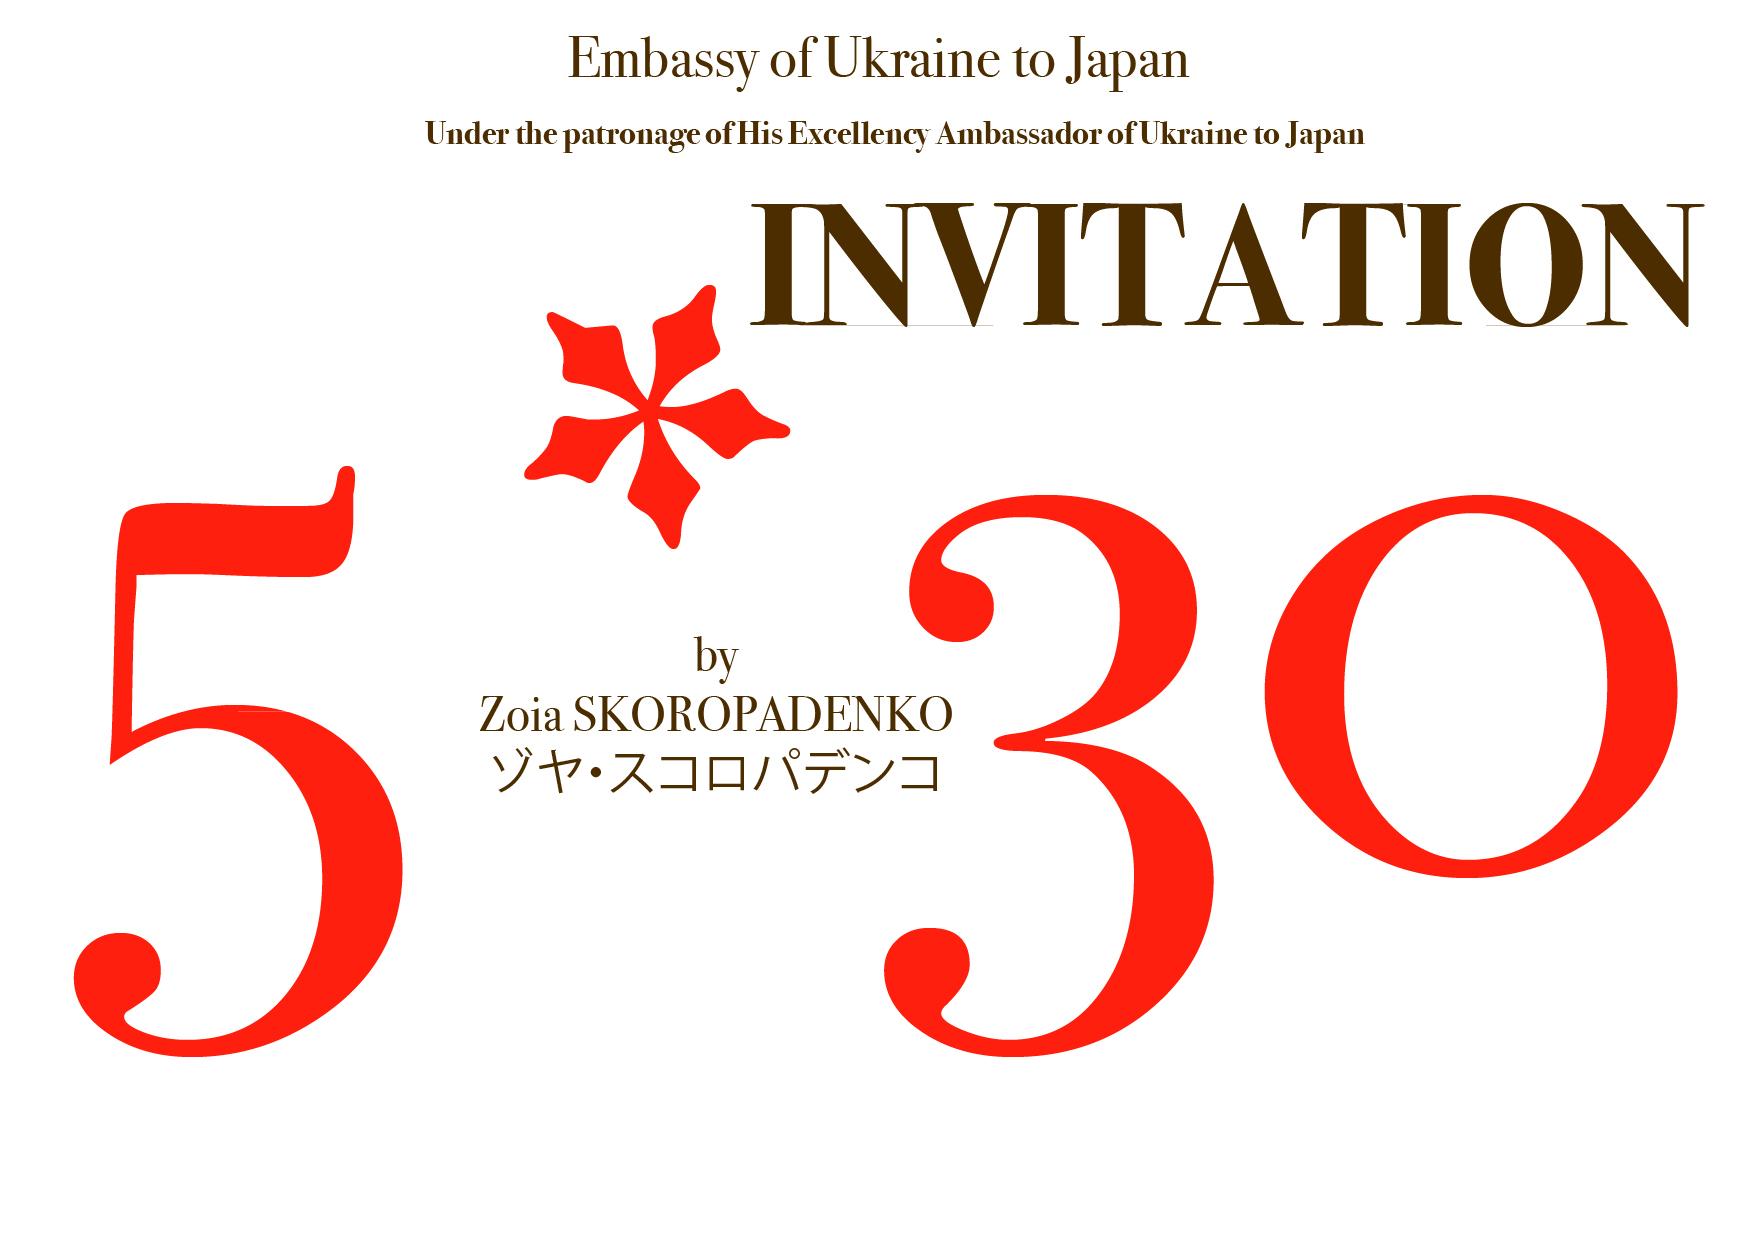 Exhibition 5*30 in Tokyo